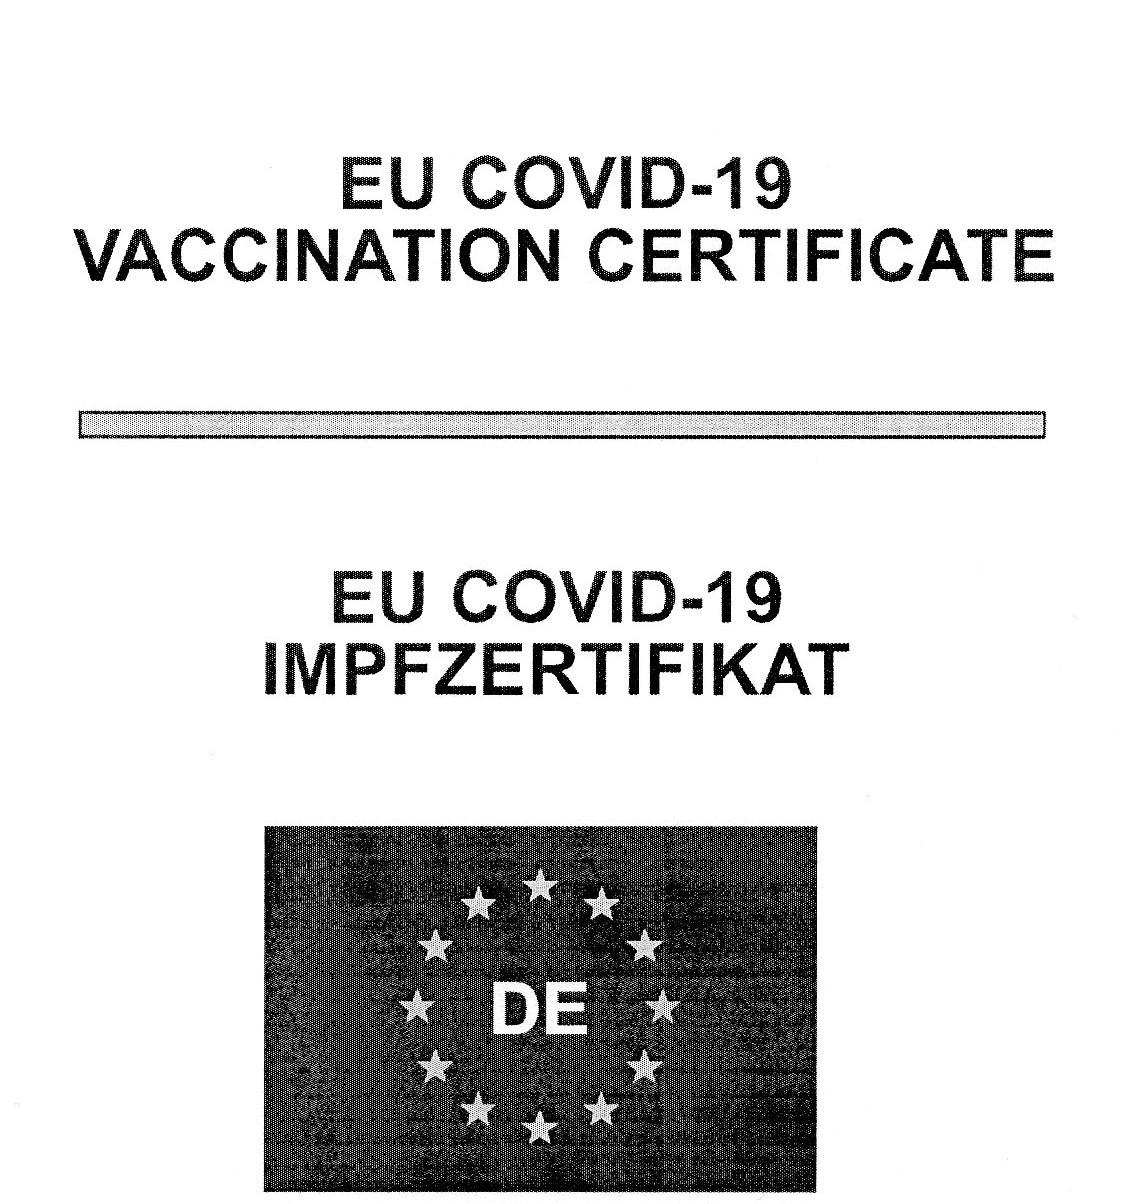 Datensicheres Impfzertifikat